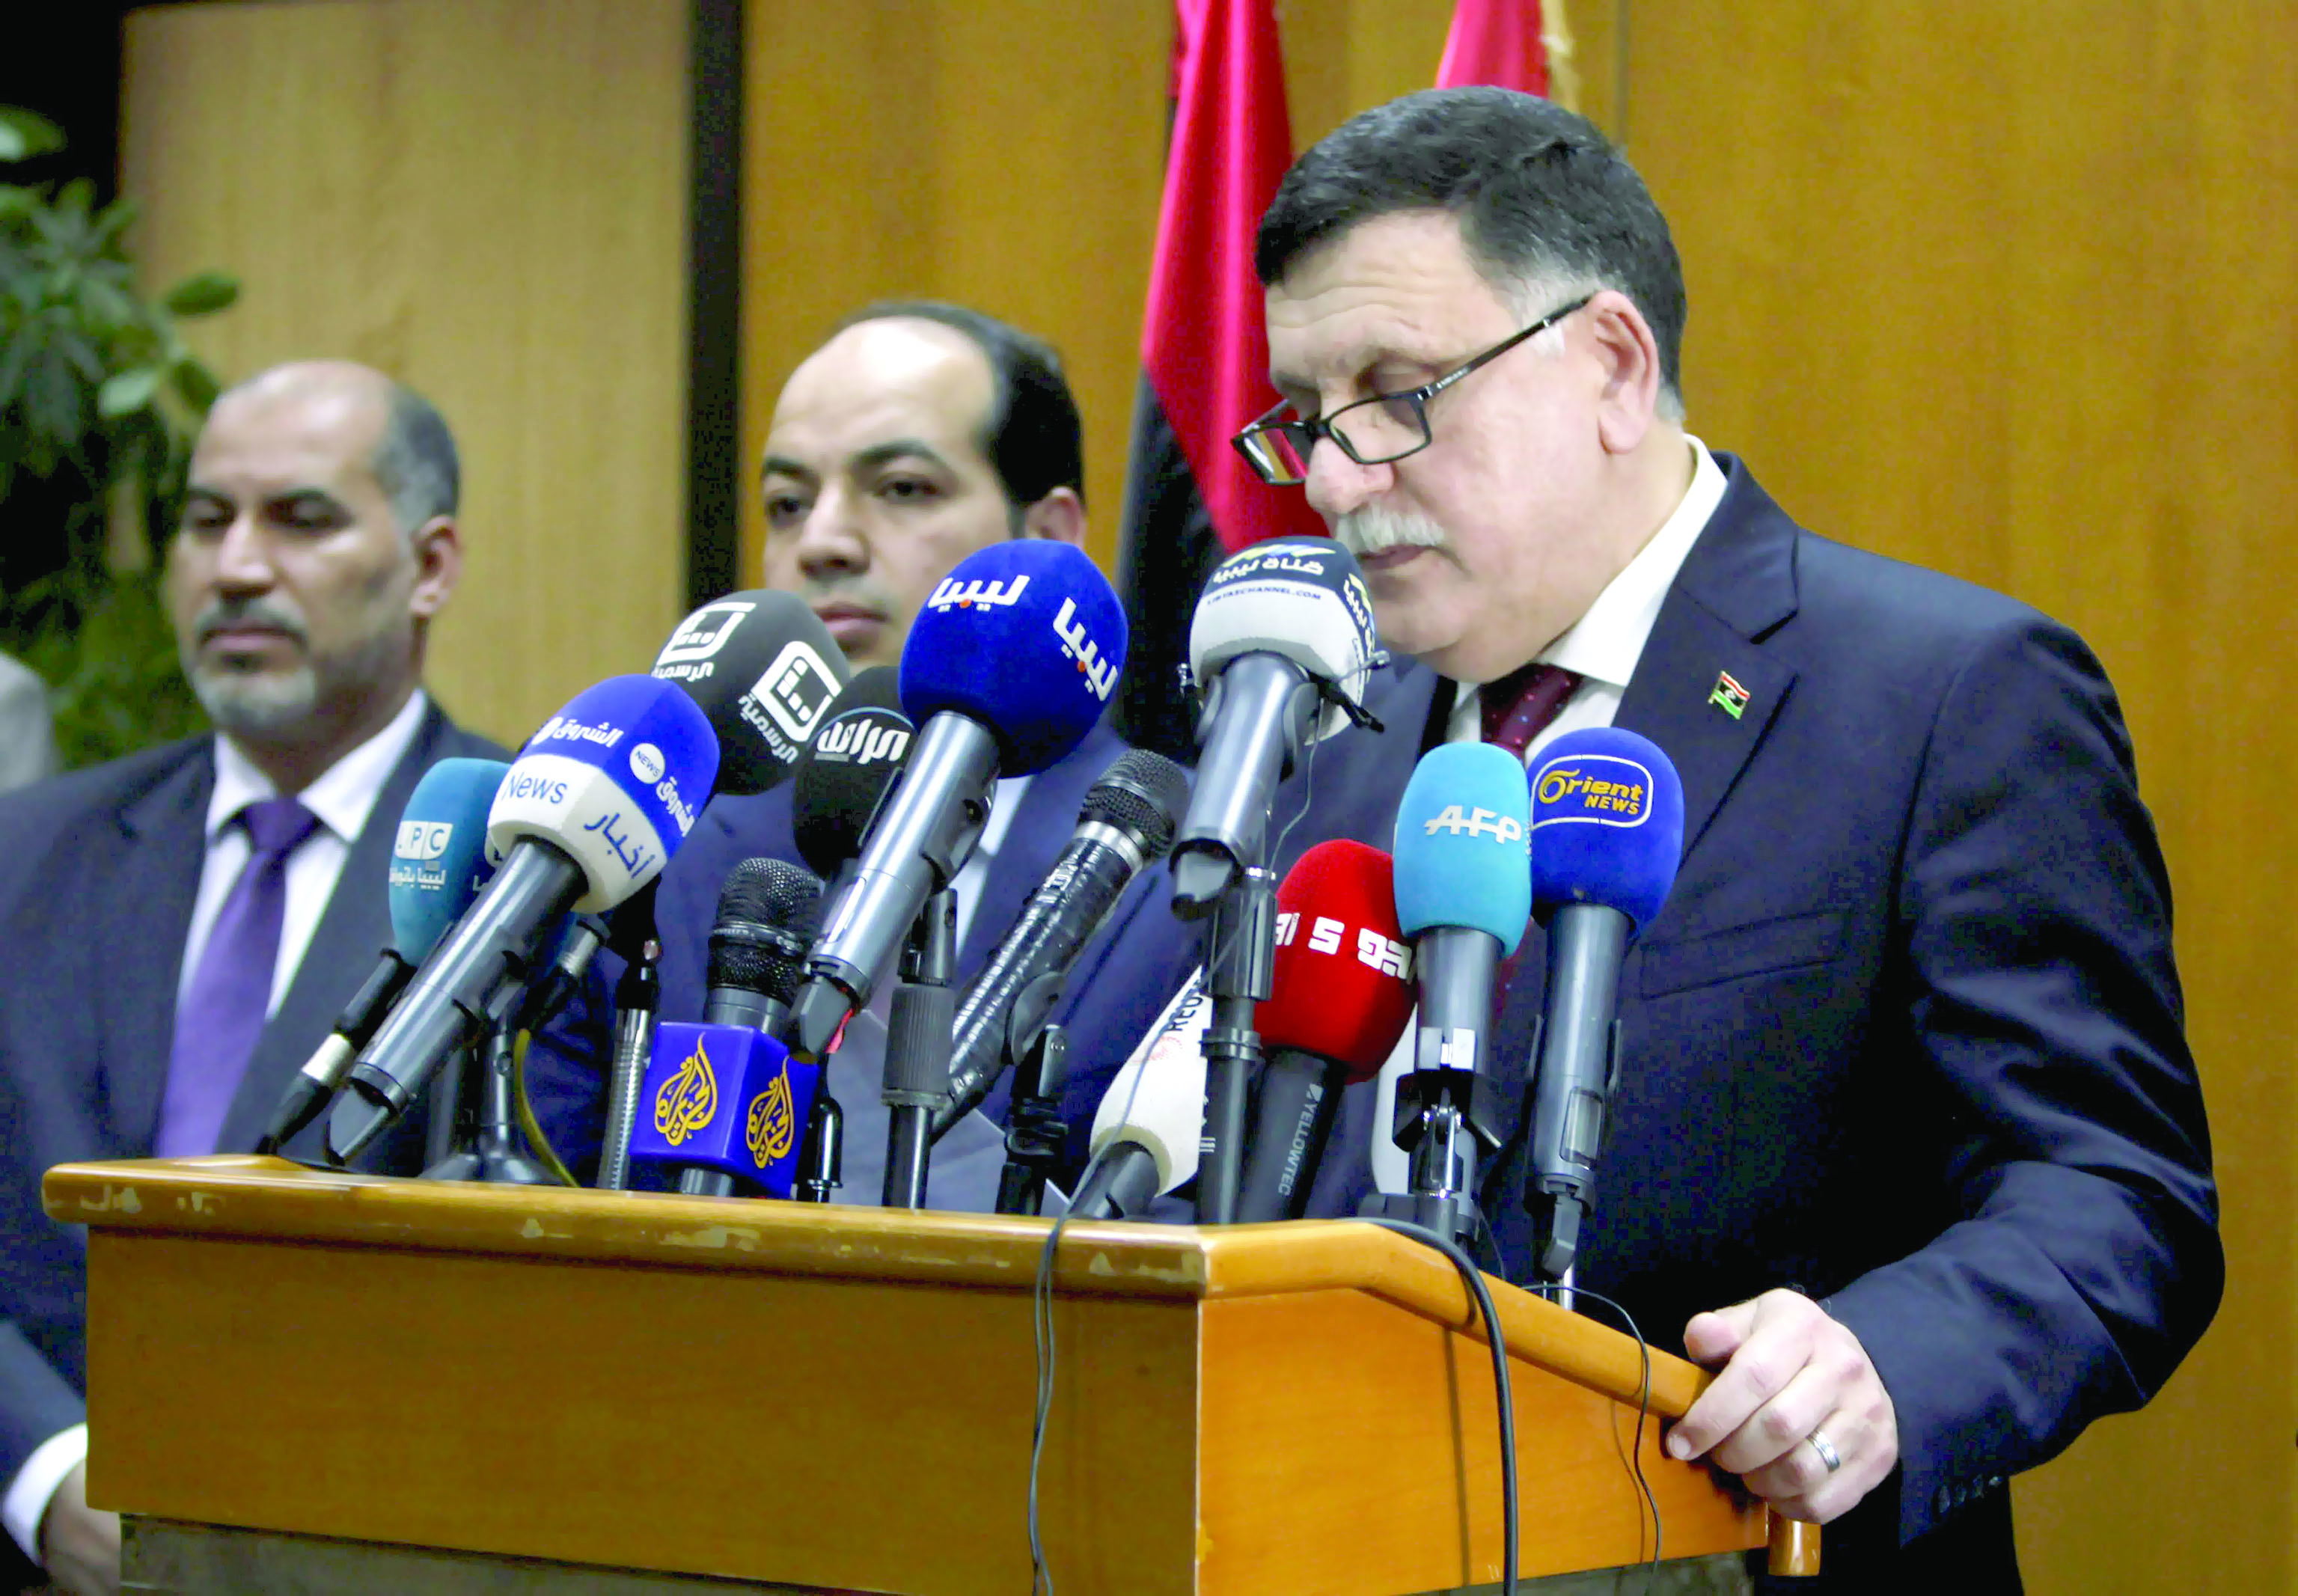 فرنسا تعرض دعماً مشروطاً على ليبيا